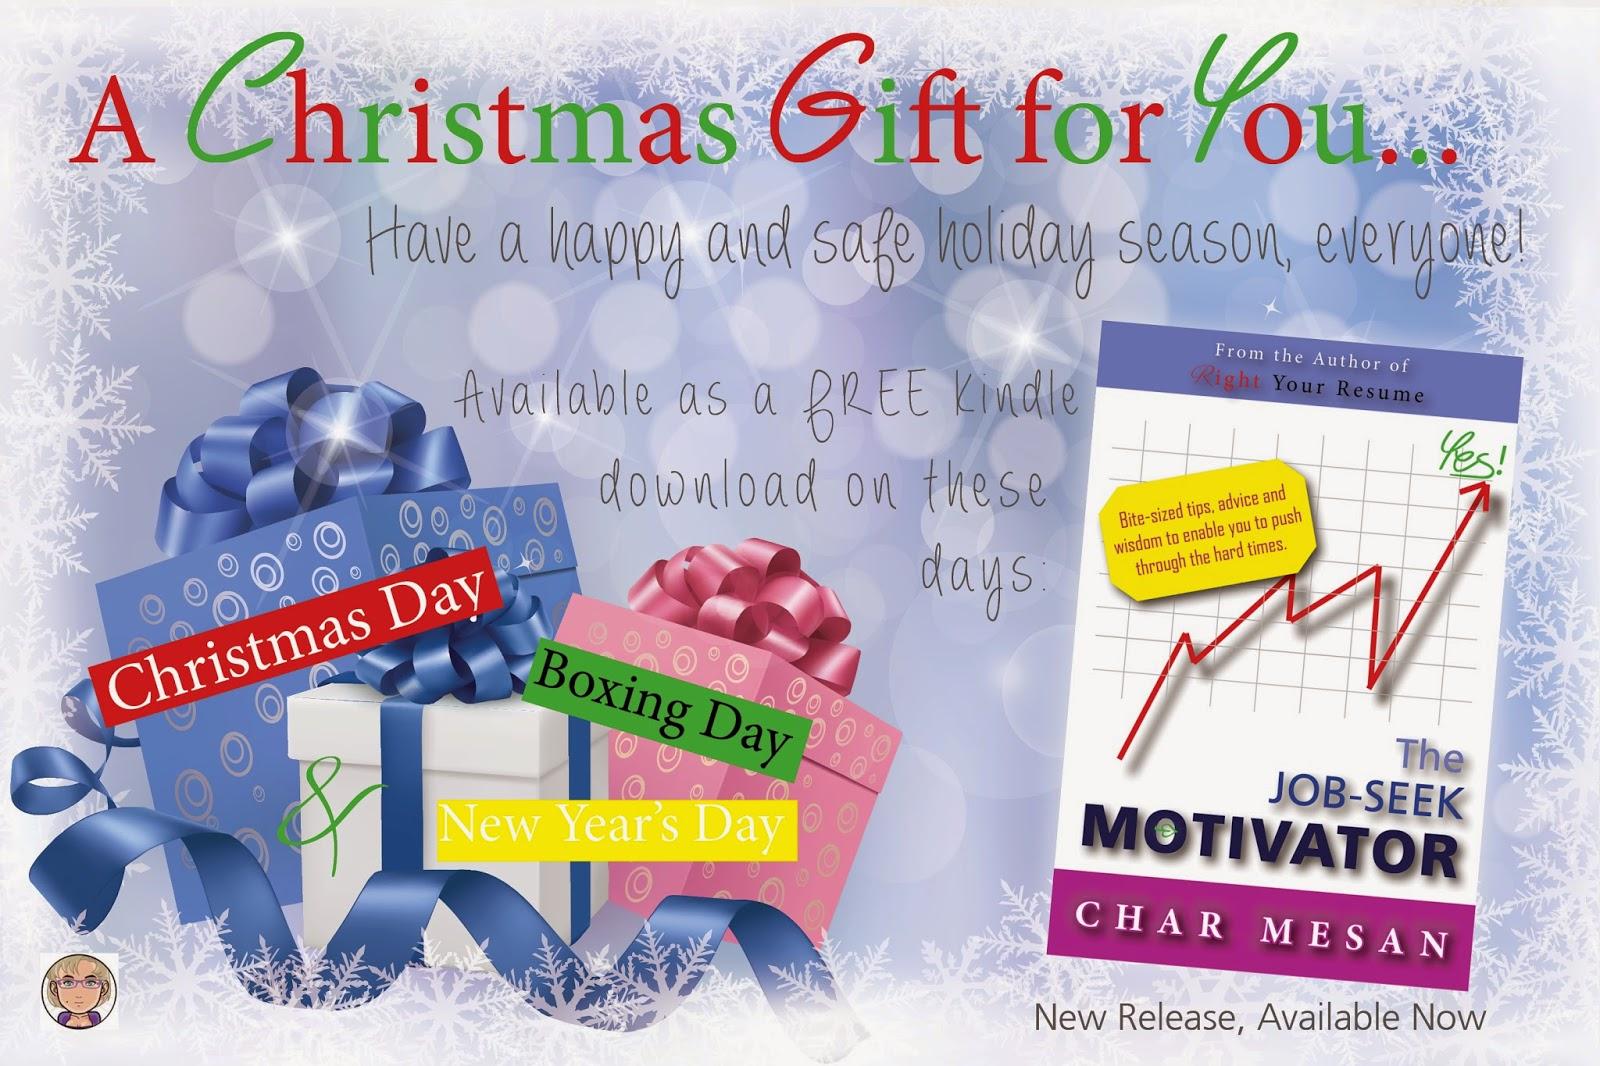 "<a href=""http://www.amazon.com/gp/offer-listing/B00R7V9PKQ/ref=as_li_tl?ie=UTF8&camp=1789&creative=9325&creativeASIN=B00R7V9PKQ&linkCode=am2&tag=chameswri-20&linkId=EEUJSFYHNXTFWQRA"">The Job-Seek Motivator: Bite-sized tips, advice and wisdom to enable you to push through the hard times</a><img src=""http://ir-na.amazon-adsystem.com/e/ir?t=chameswri-20&l=am2&o=1&a=B00R7V9PKQ"" width=""1"" height=""1"" border=""0"" alt="""" style=""border:none !important; margin:0px !important;"" />"